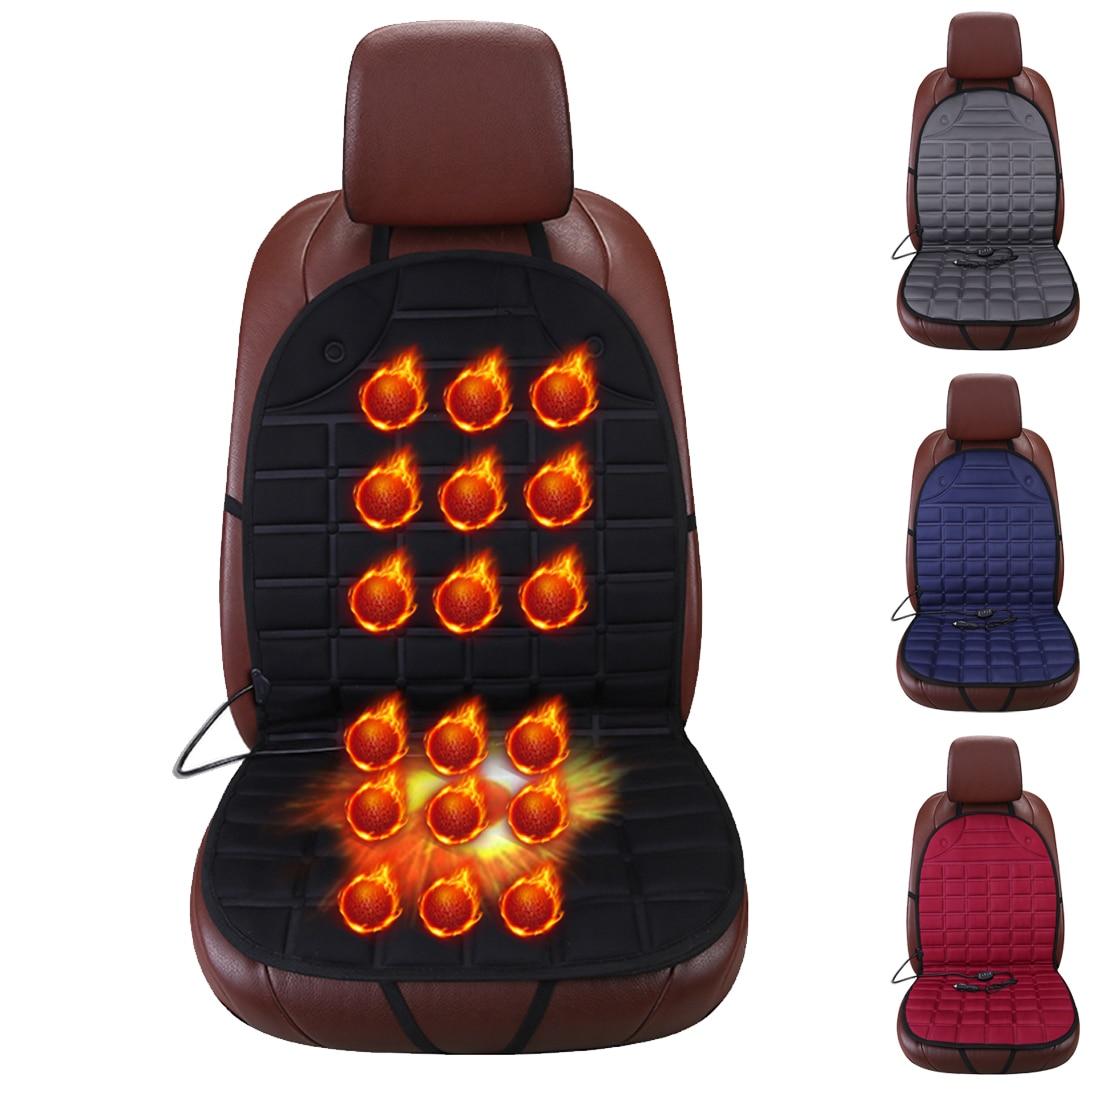 12v Car Seat Heater Thickening Heated Pad Cushion Winter: Aliexpress.com : Buy Dewtreetali 12V Seat Heated Front Car